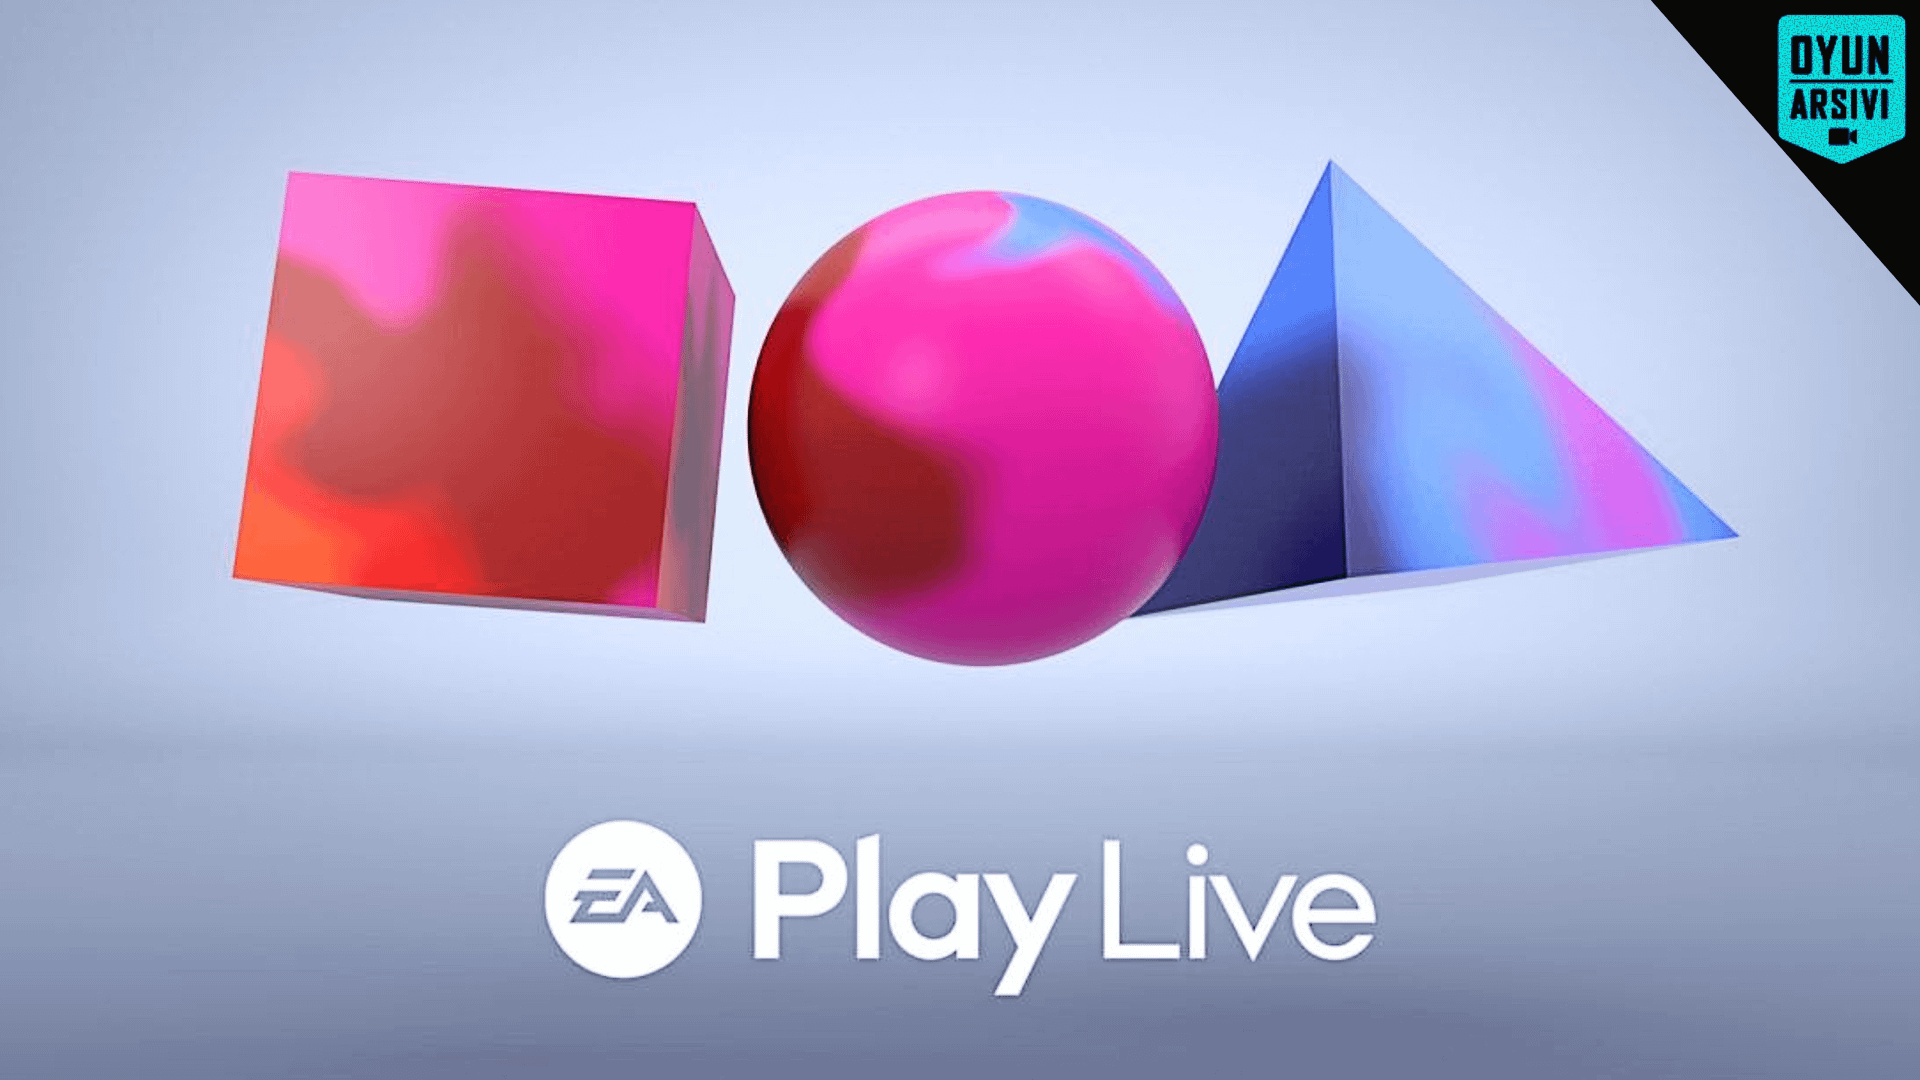 EA Play Live 2021 Oyun Arşivi